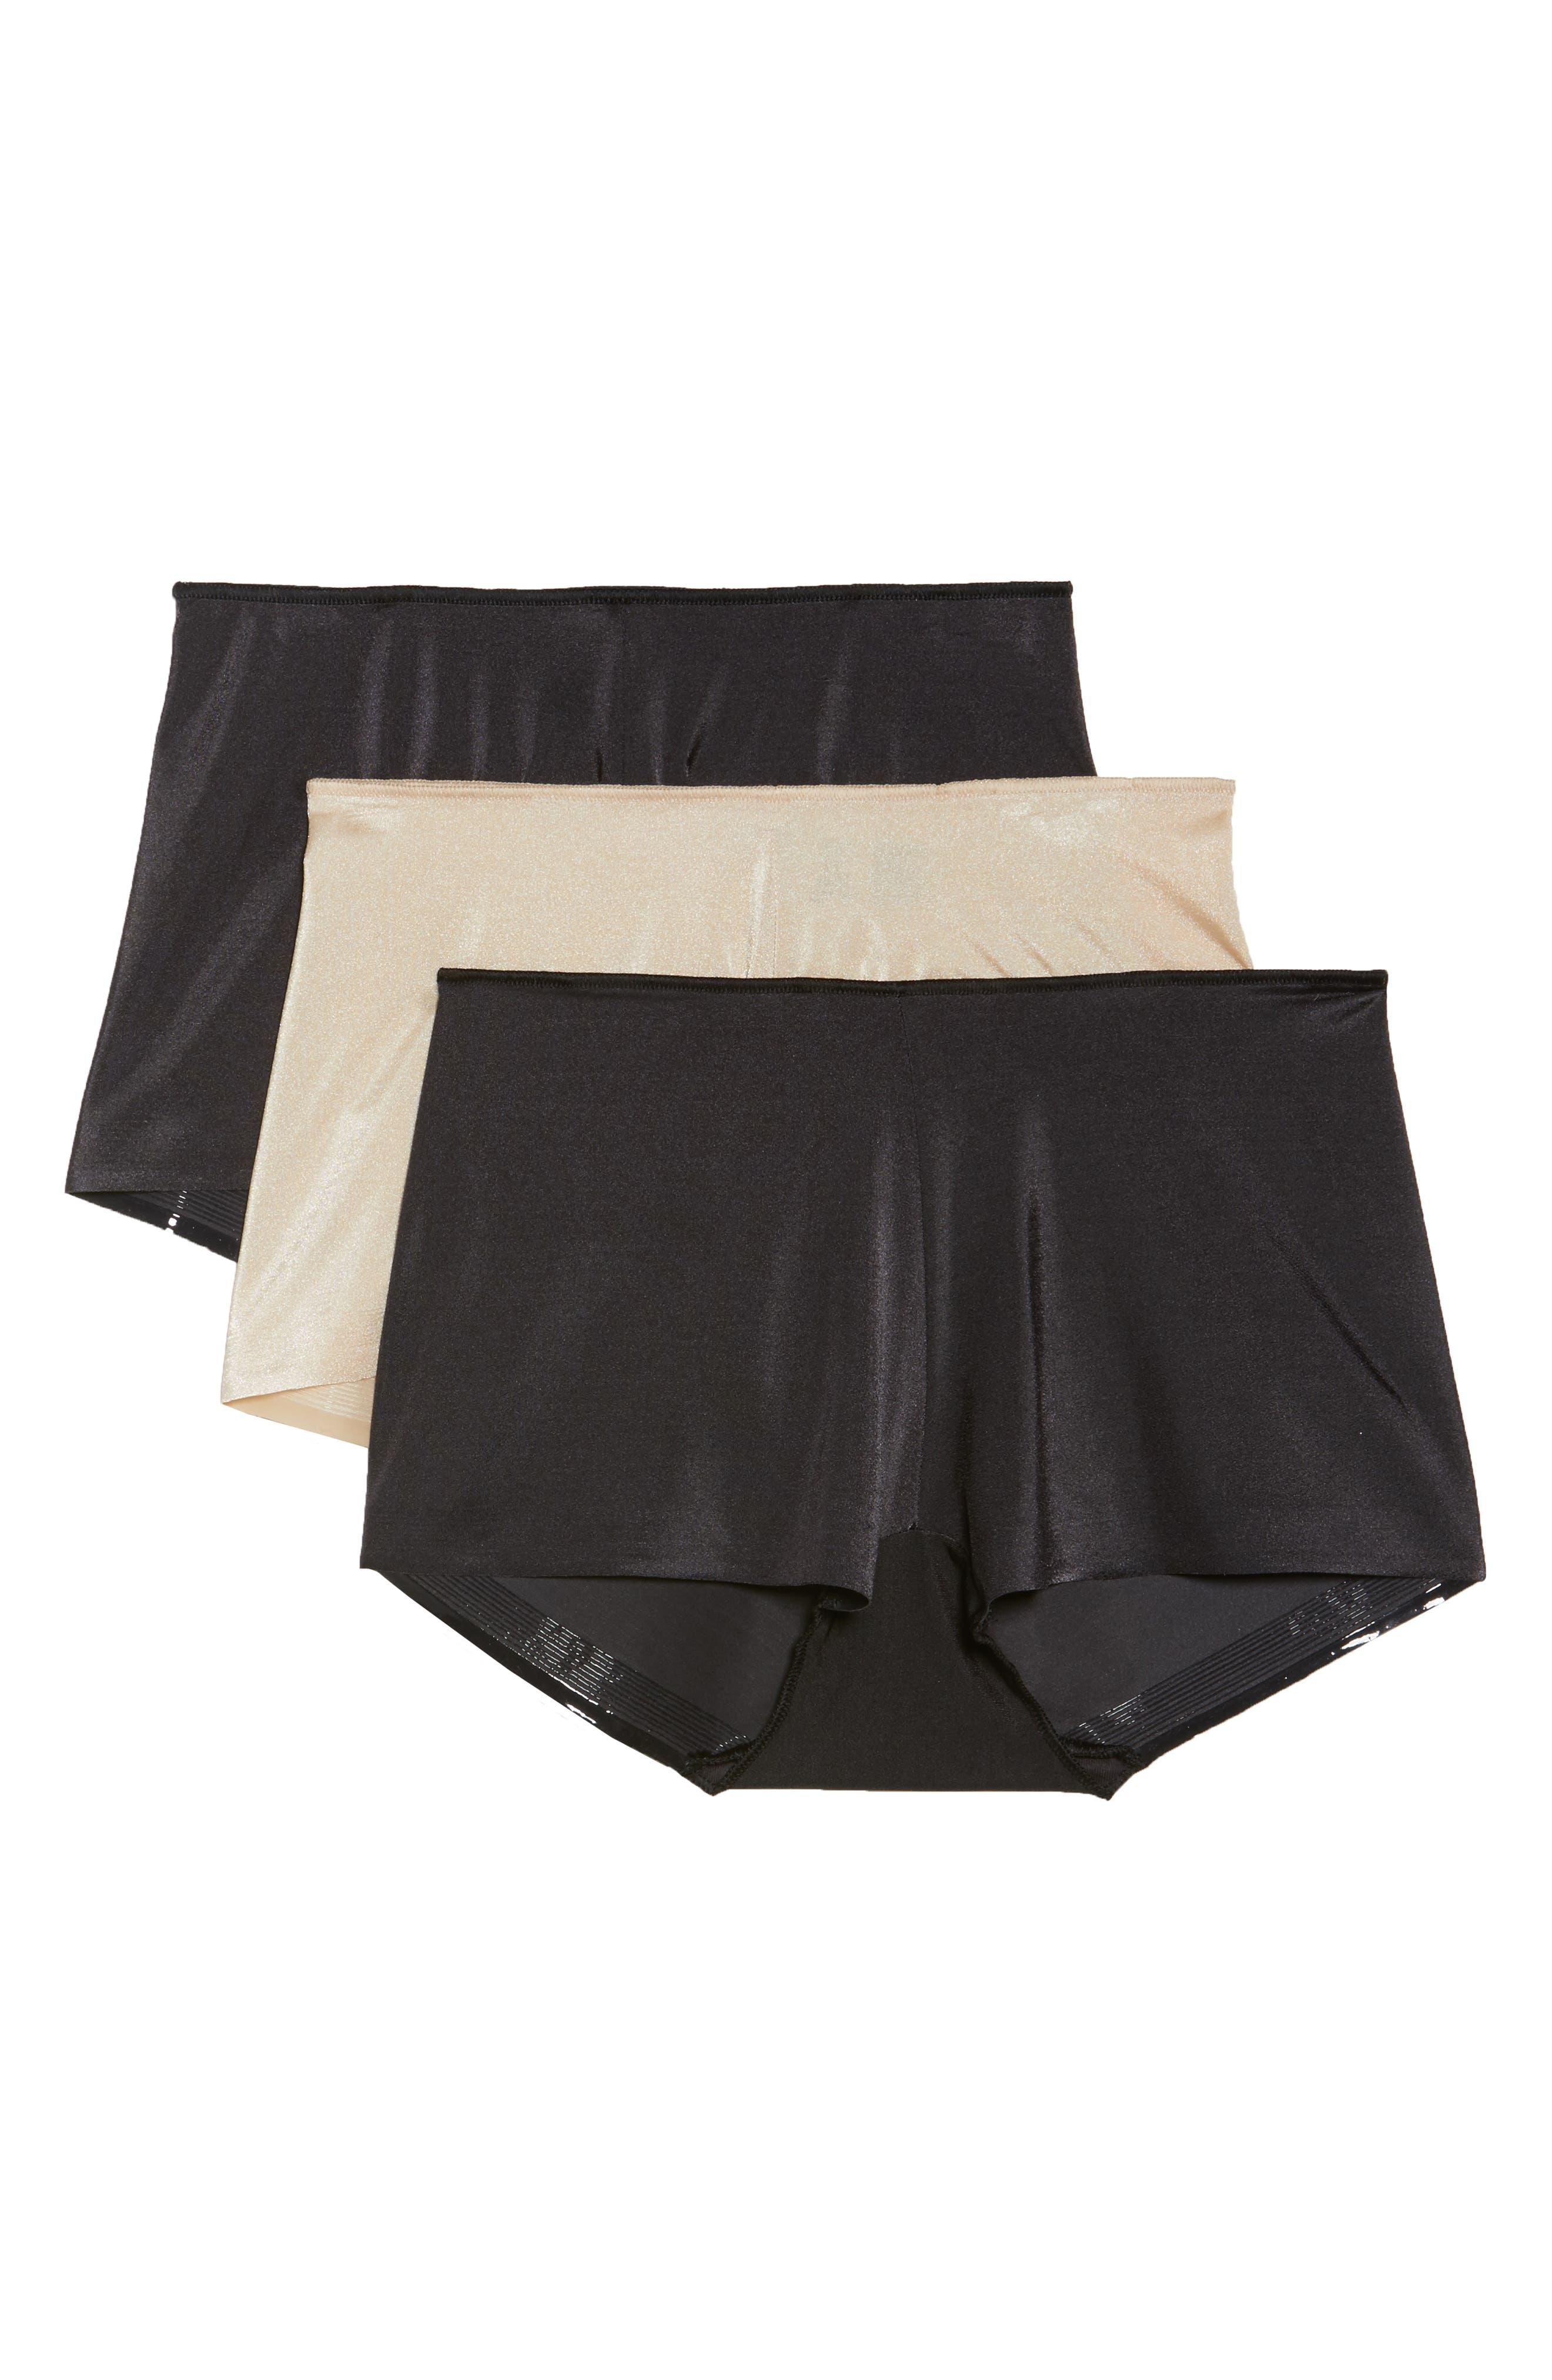 3-Pack High Waist Boyshorts,                         Main,                         color, Black/ Nude